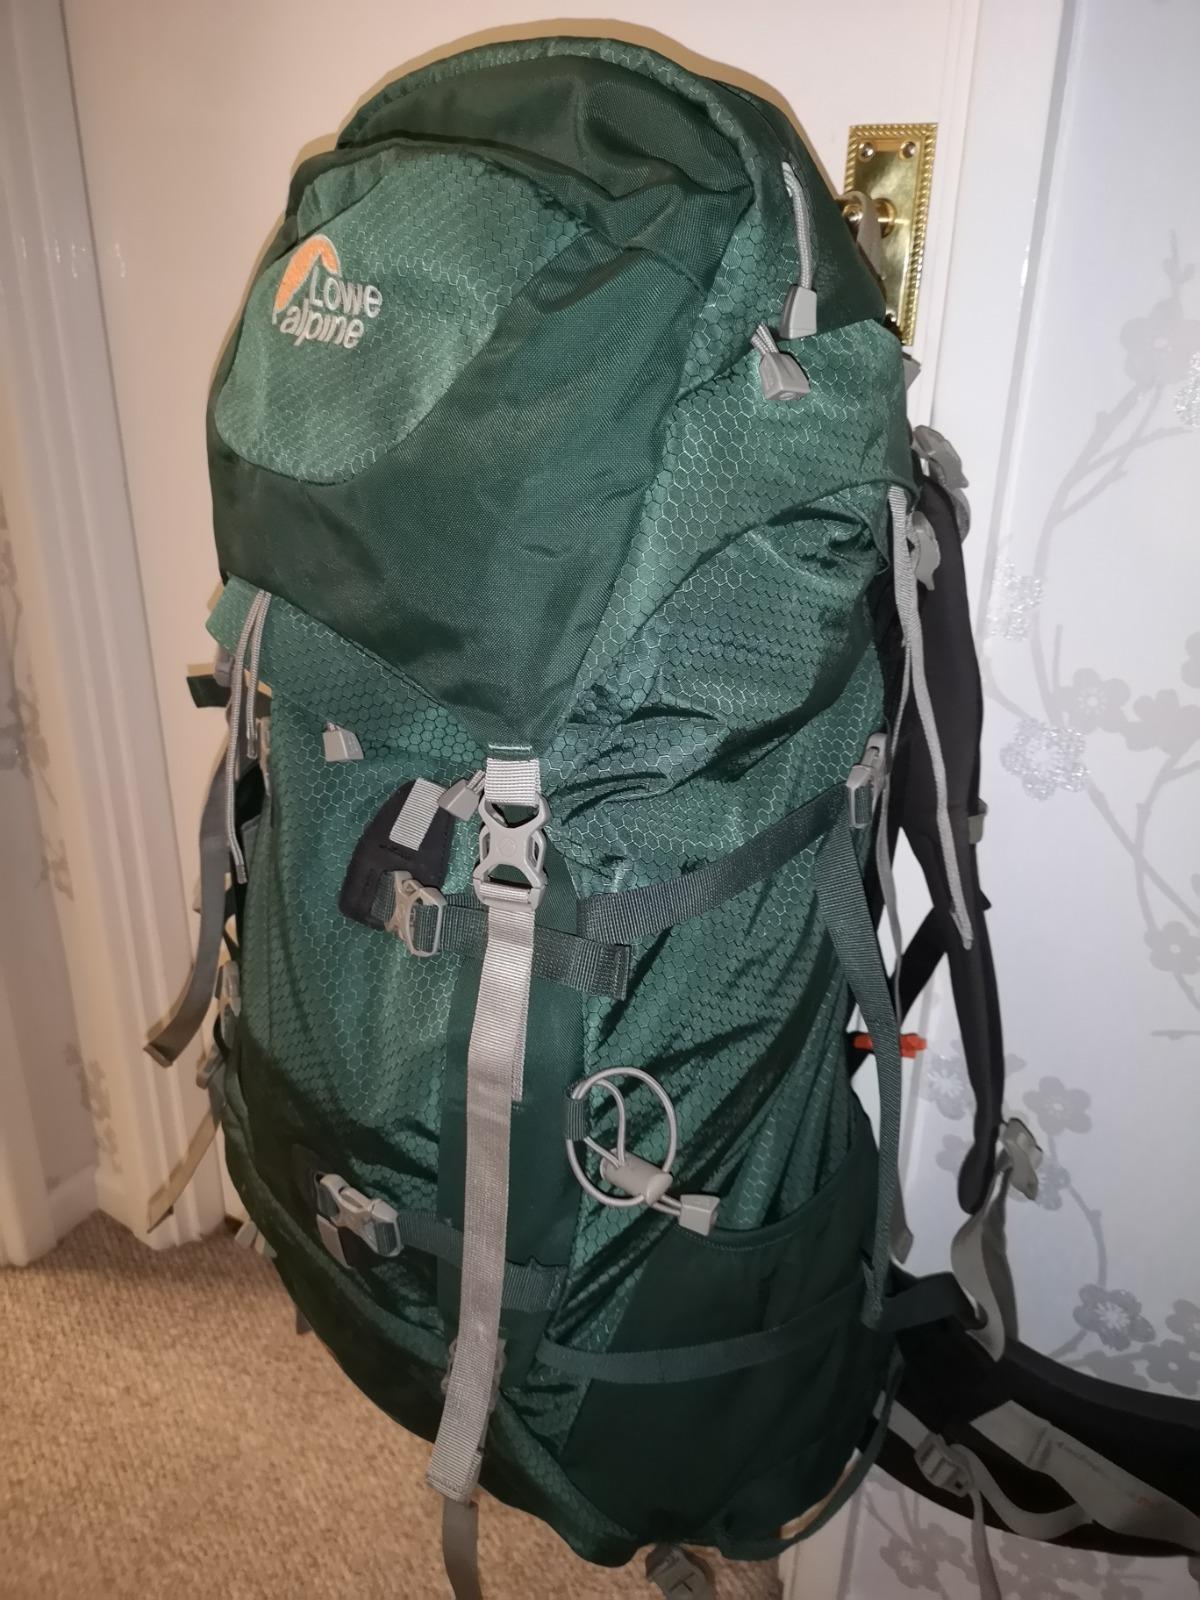 Lowe Alpine Cerro Torre 65:85L Hiking Backpack